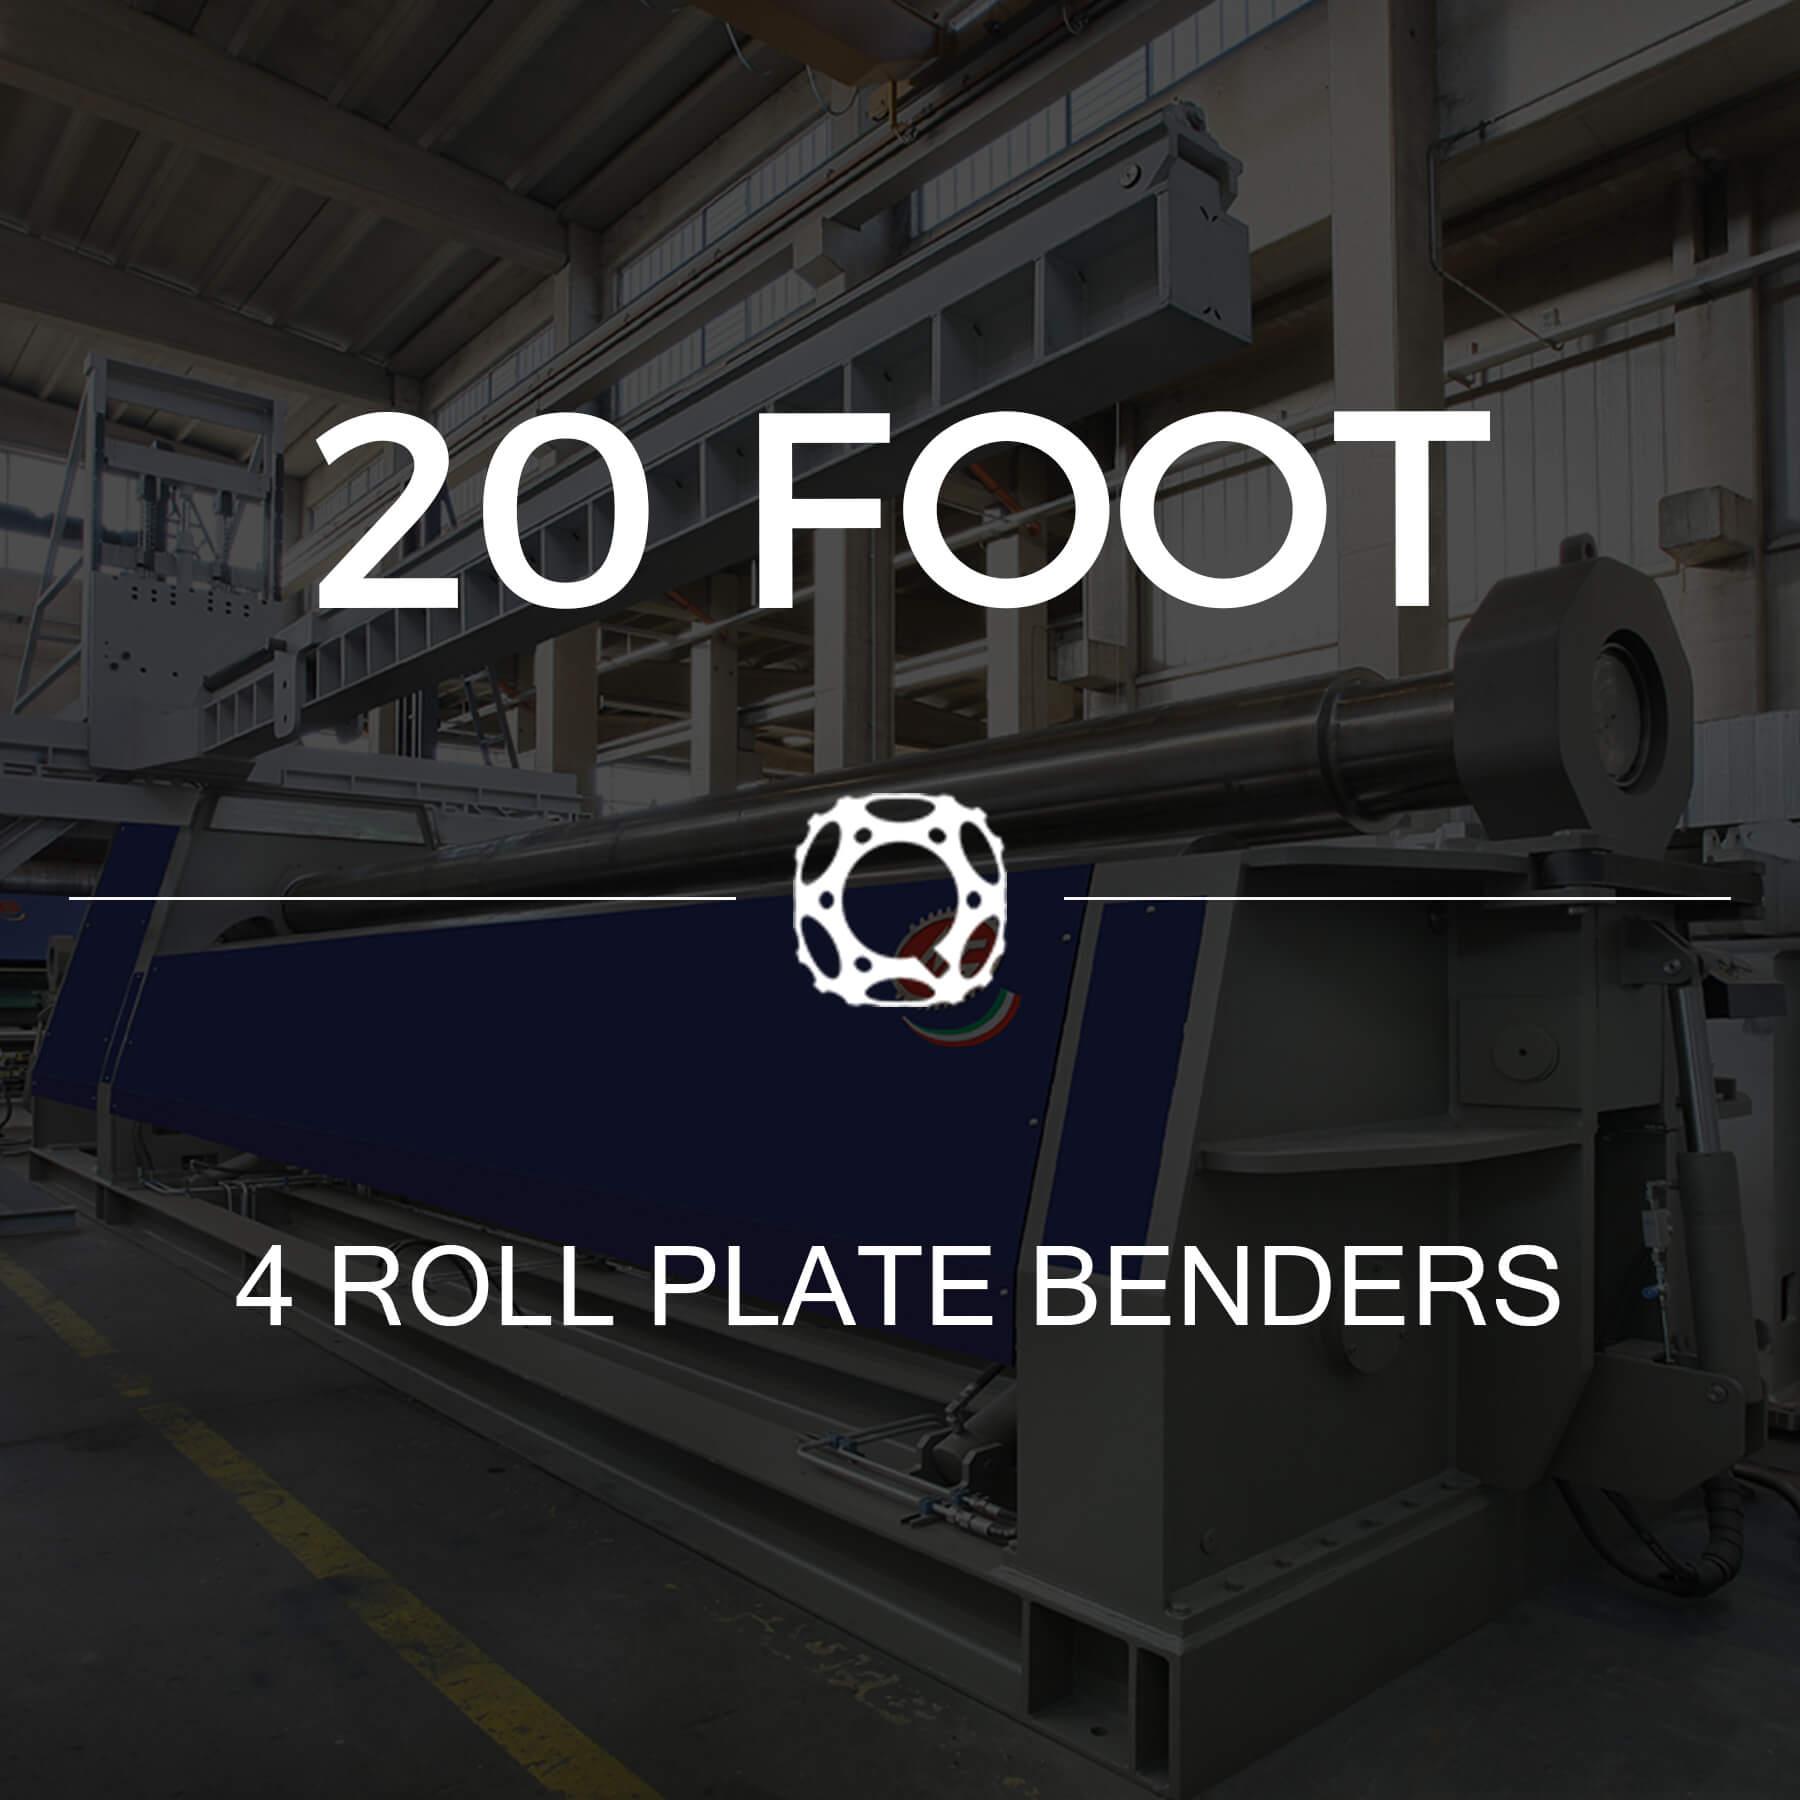 https://www.platebenders.com/4-rolls-working-lengths/20-foot-models-4-roll-plate-benders